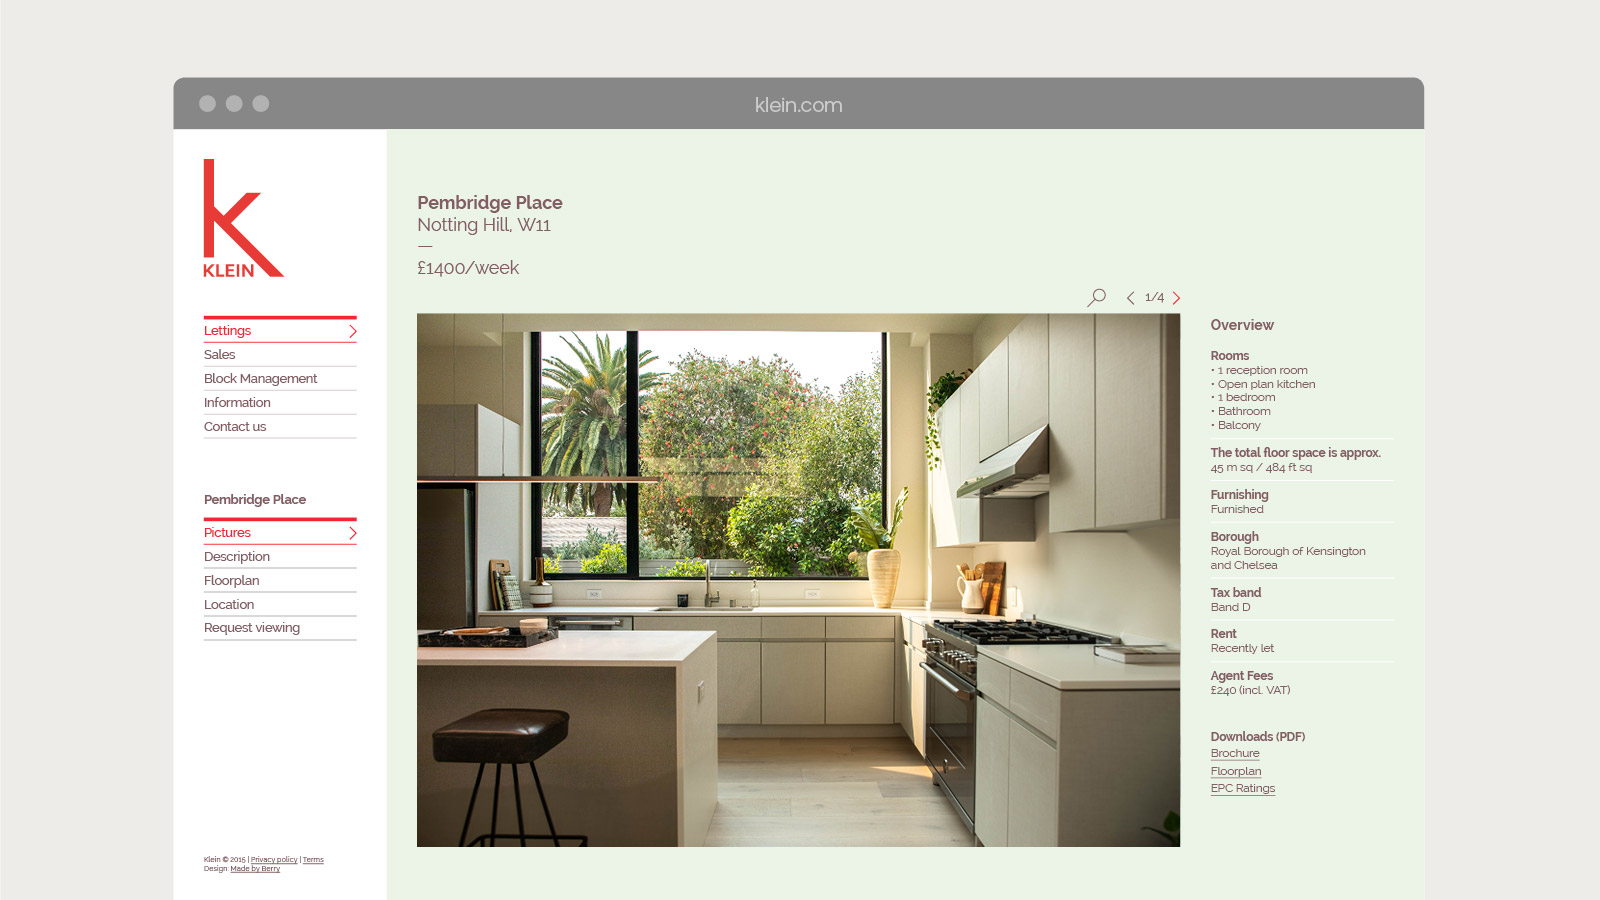 property-agency-visual-branding-identity-design-milton-keynes-london-15